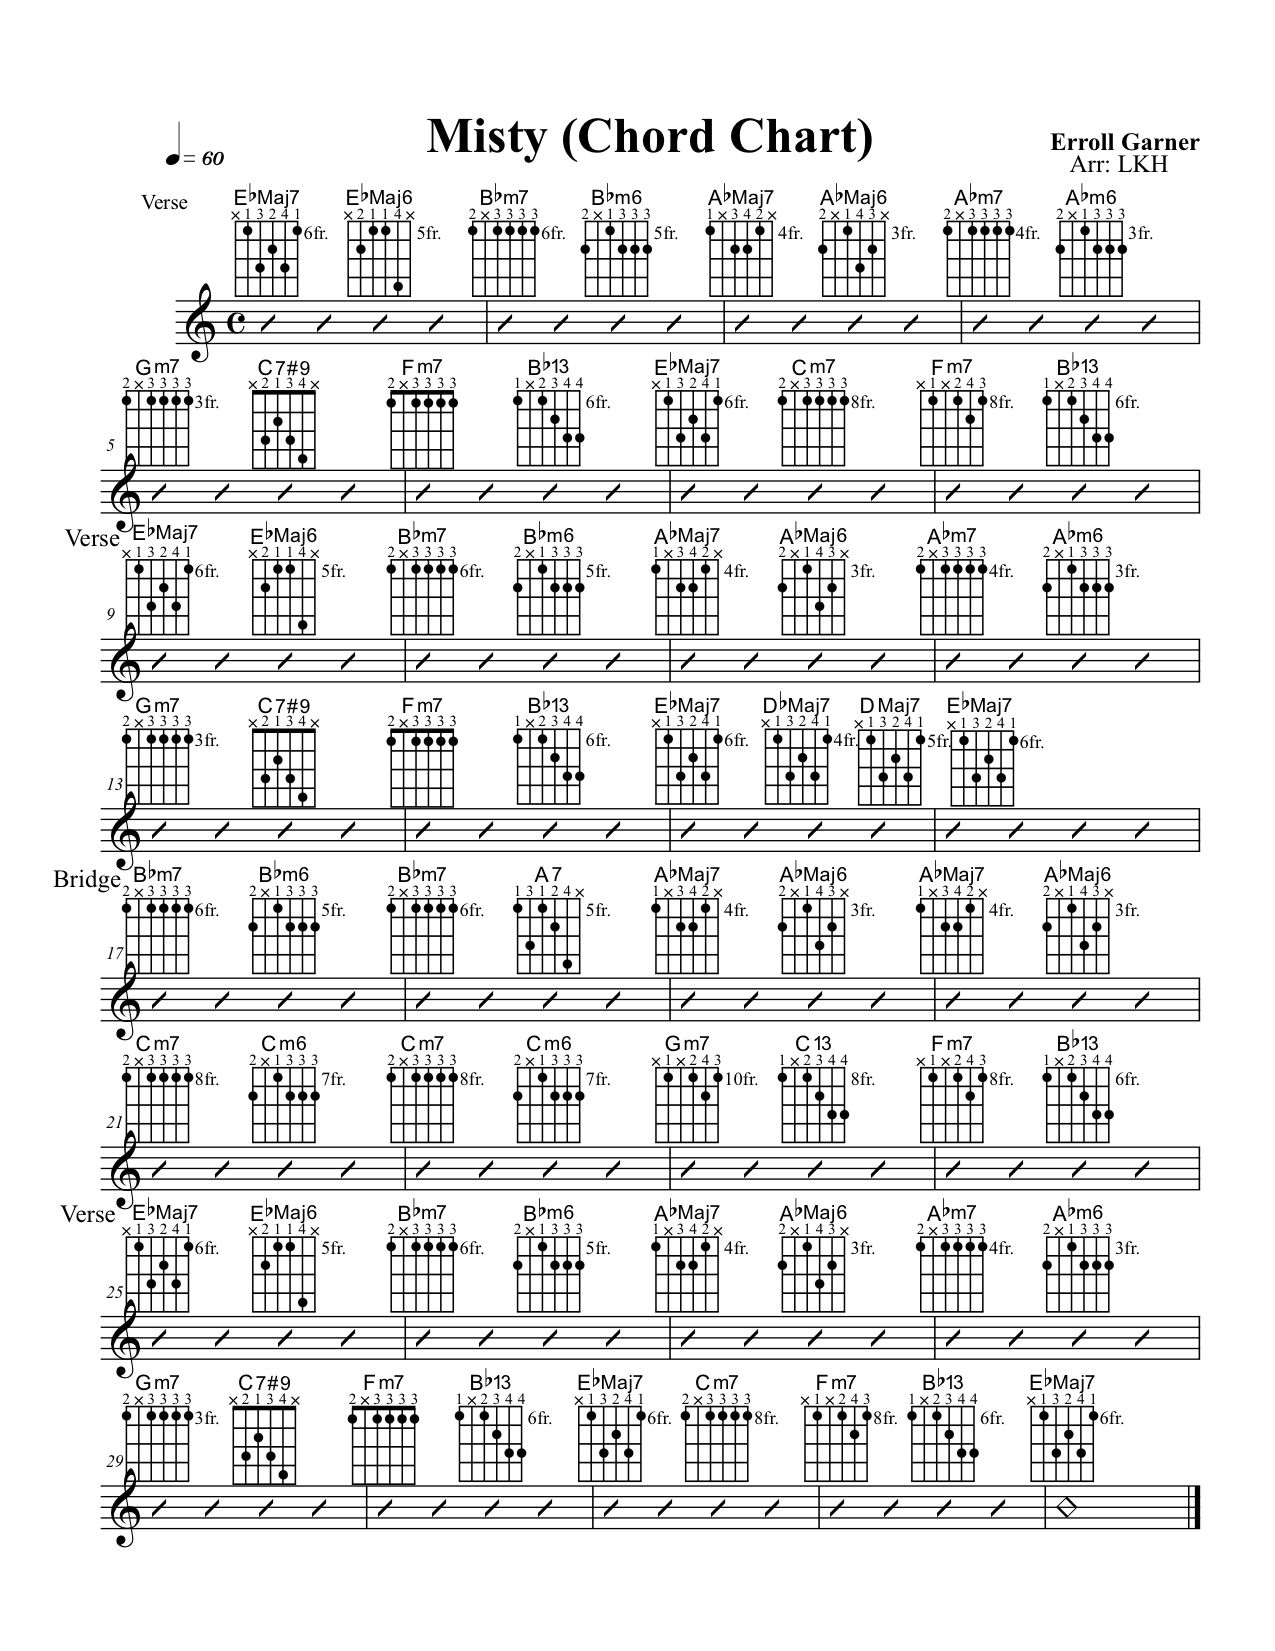 Jazz guitar chords music lessons cigar box also  misty chord melody chart modal breakdown rh pinterest